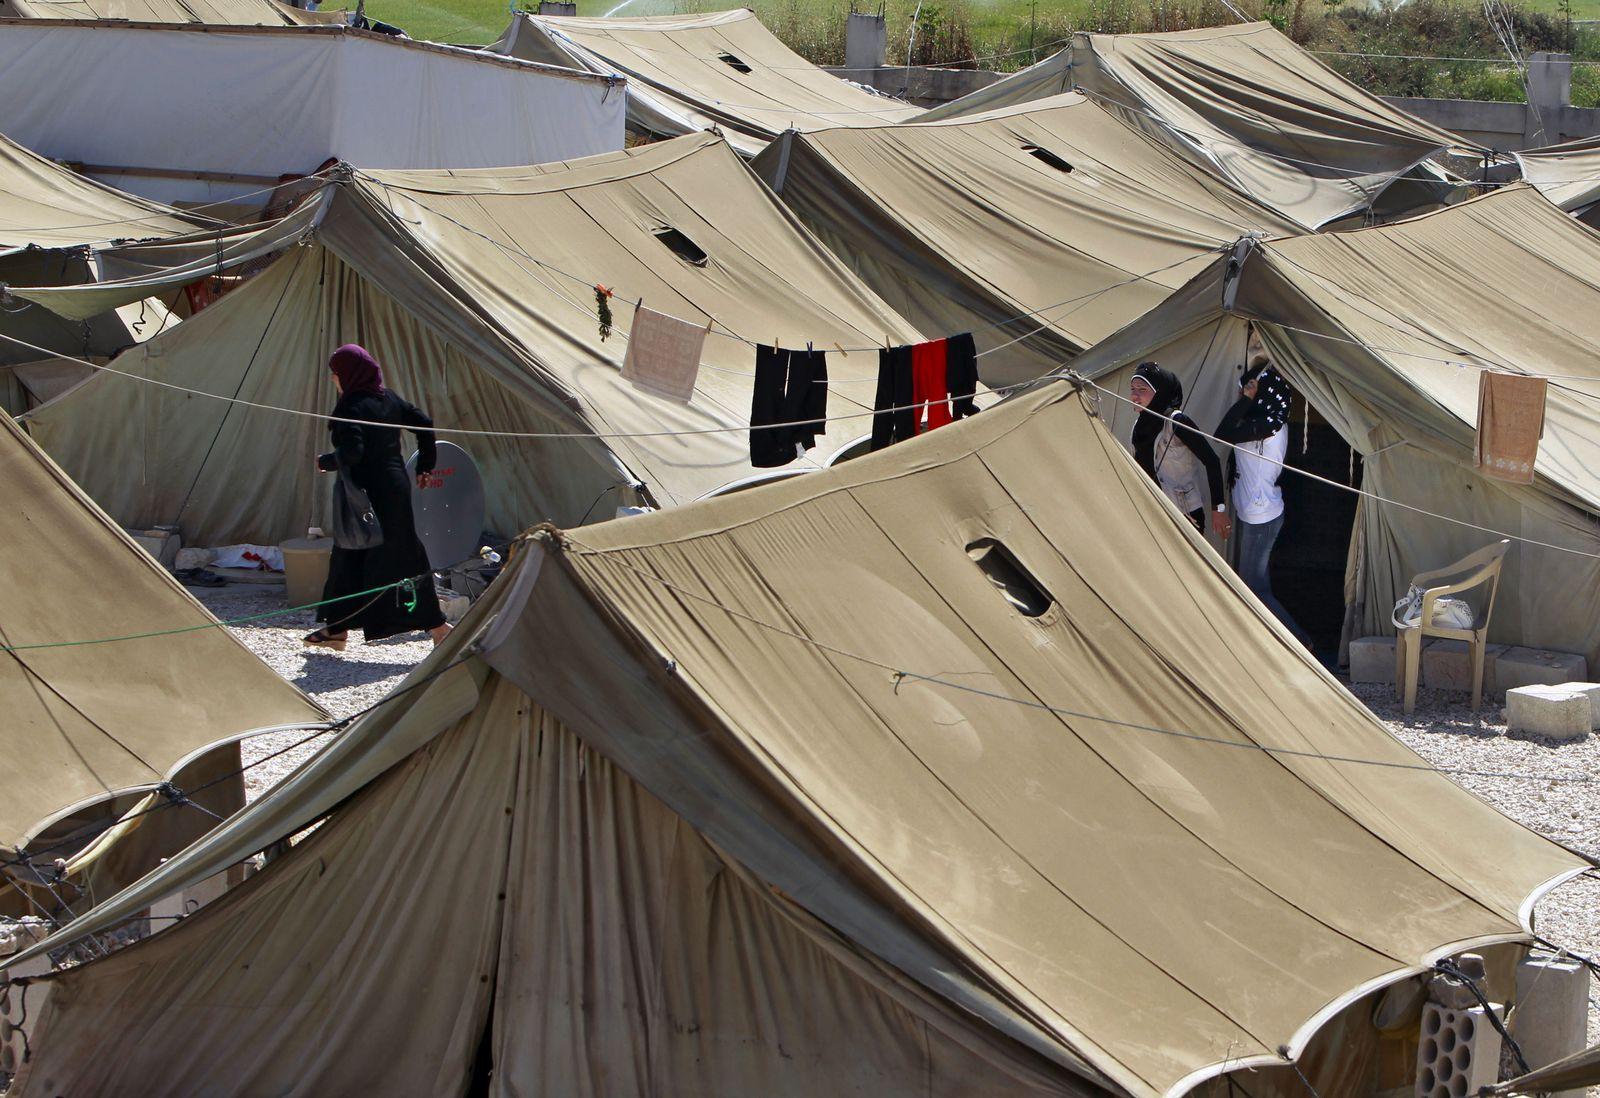 Syrische Flüchtlinge / Camp / Libanon